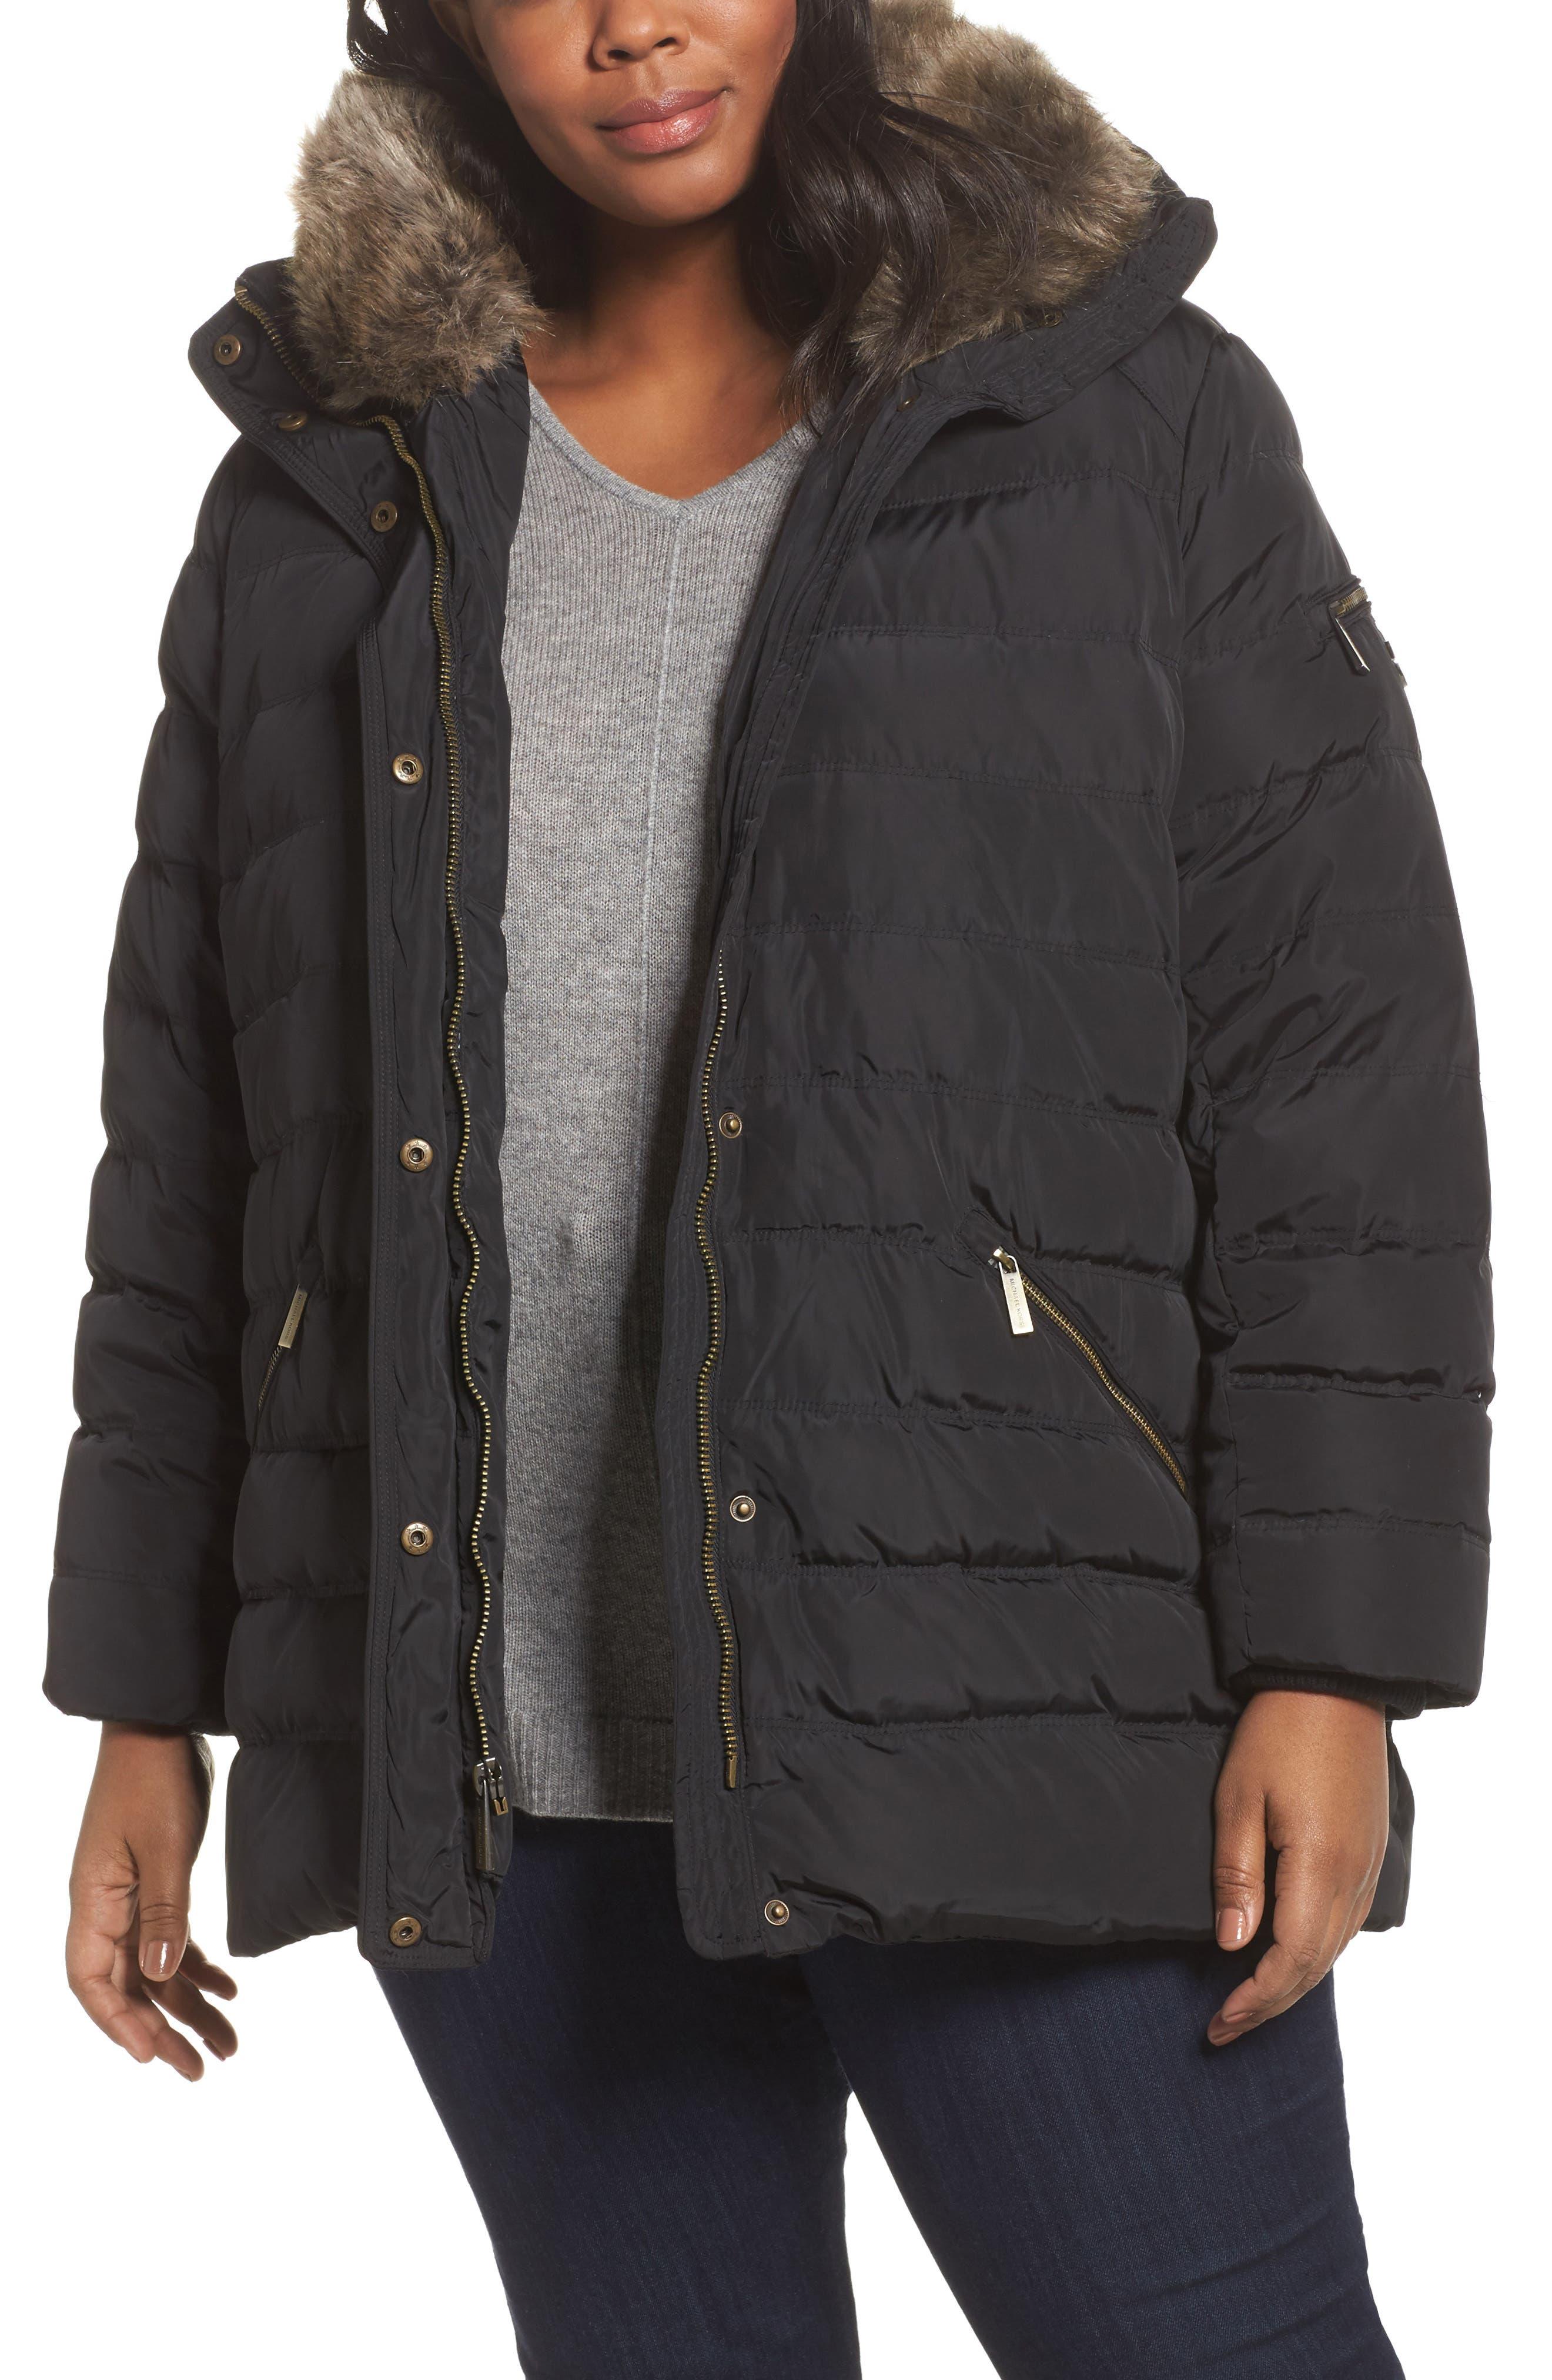 Main Image - MICHAEL Michael Kors Down & Feather Hooded Coat with Faux Fur Trim (Plus Size)